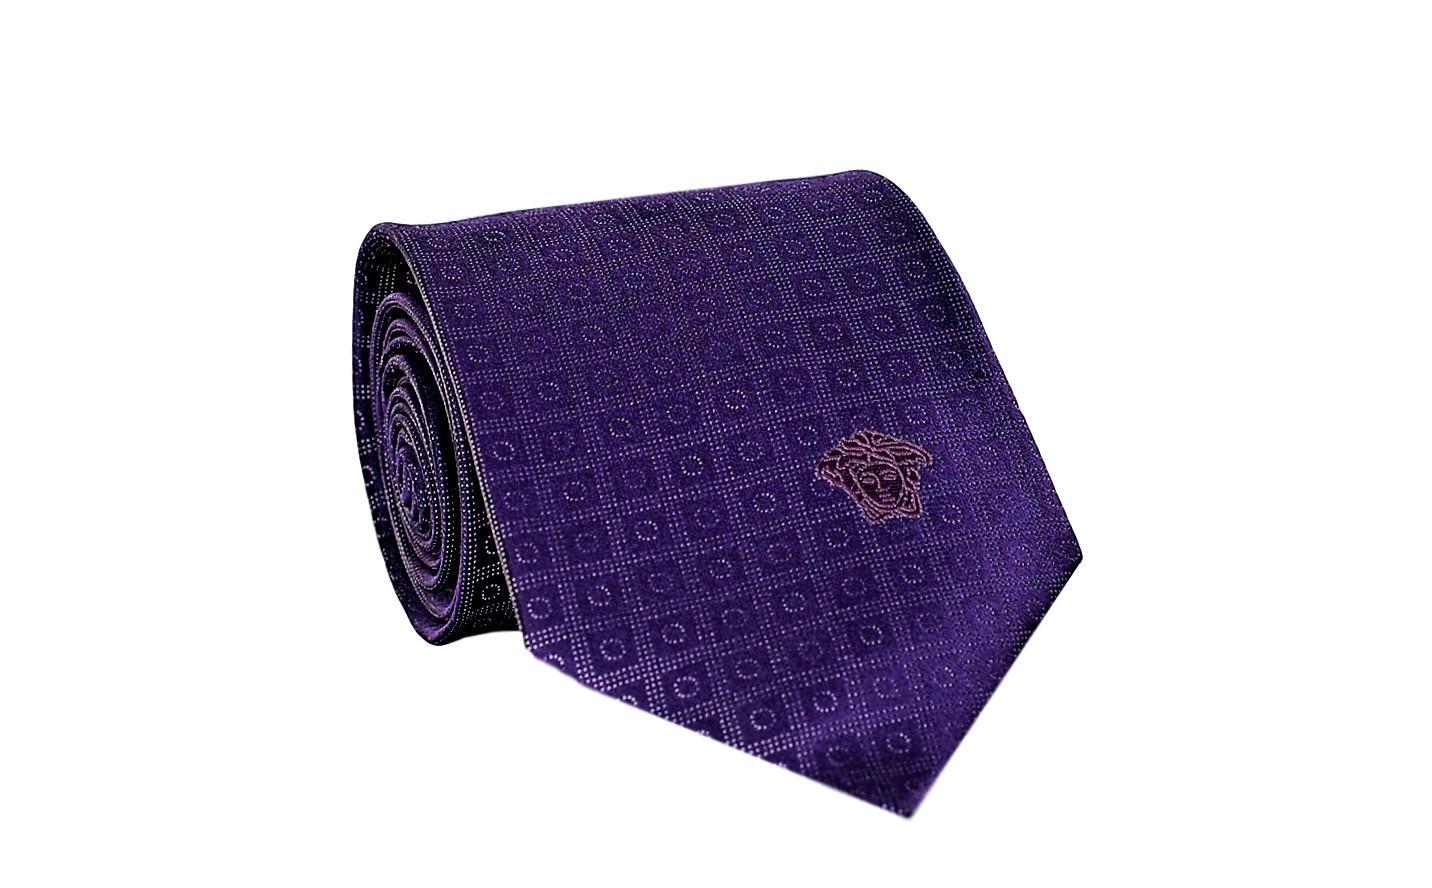 Versace Men's Geometrical Square Patterned Silk Necktie Purple-White